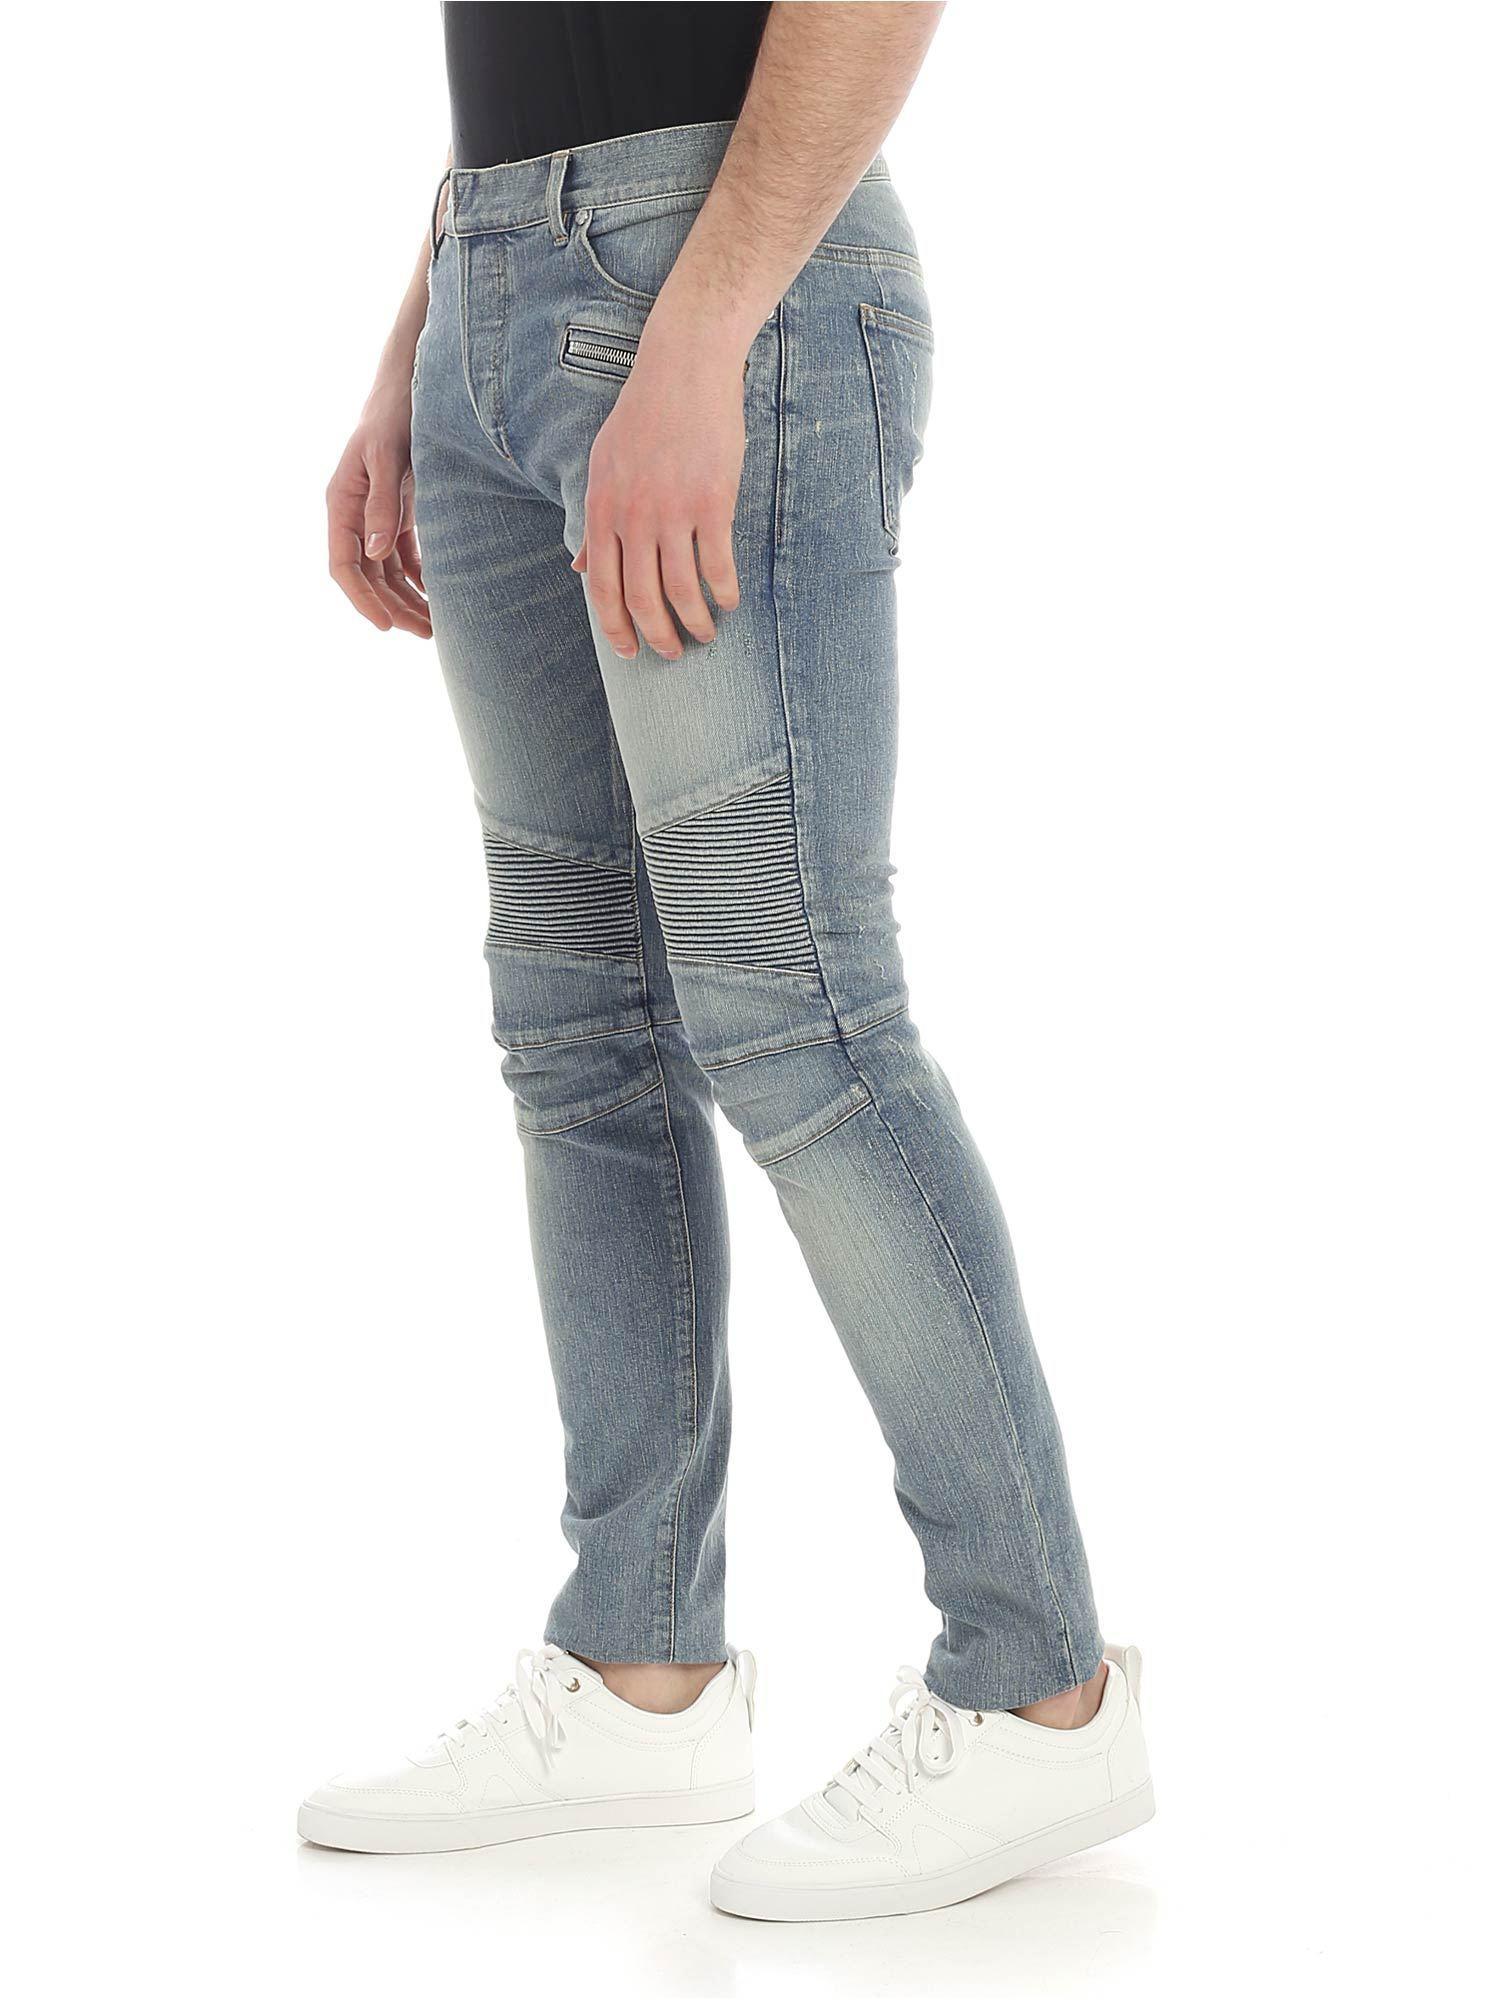 504d20b3 Balmain Slim Fit Biker Jeans in Blue for Men - Lyst